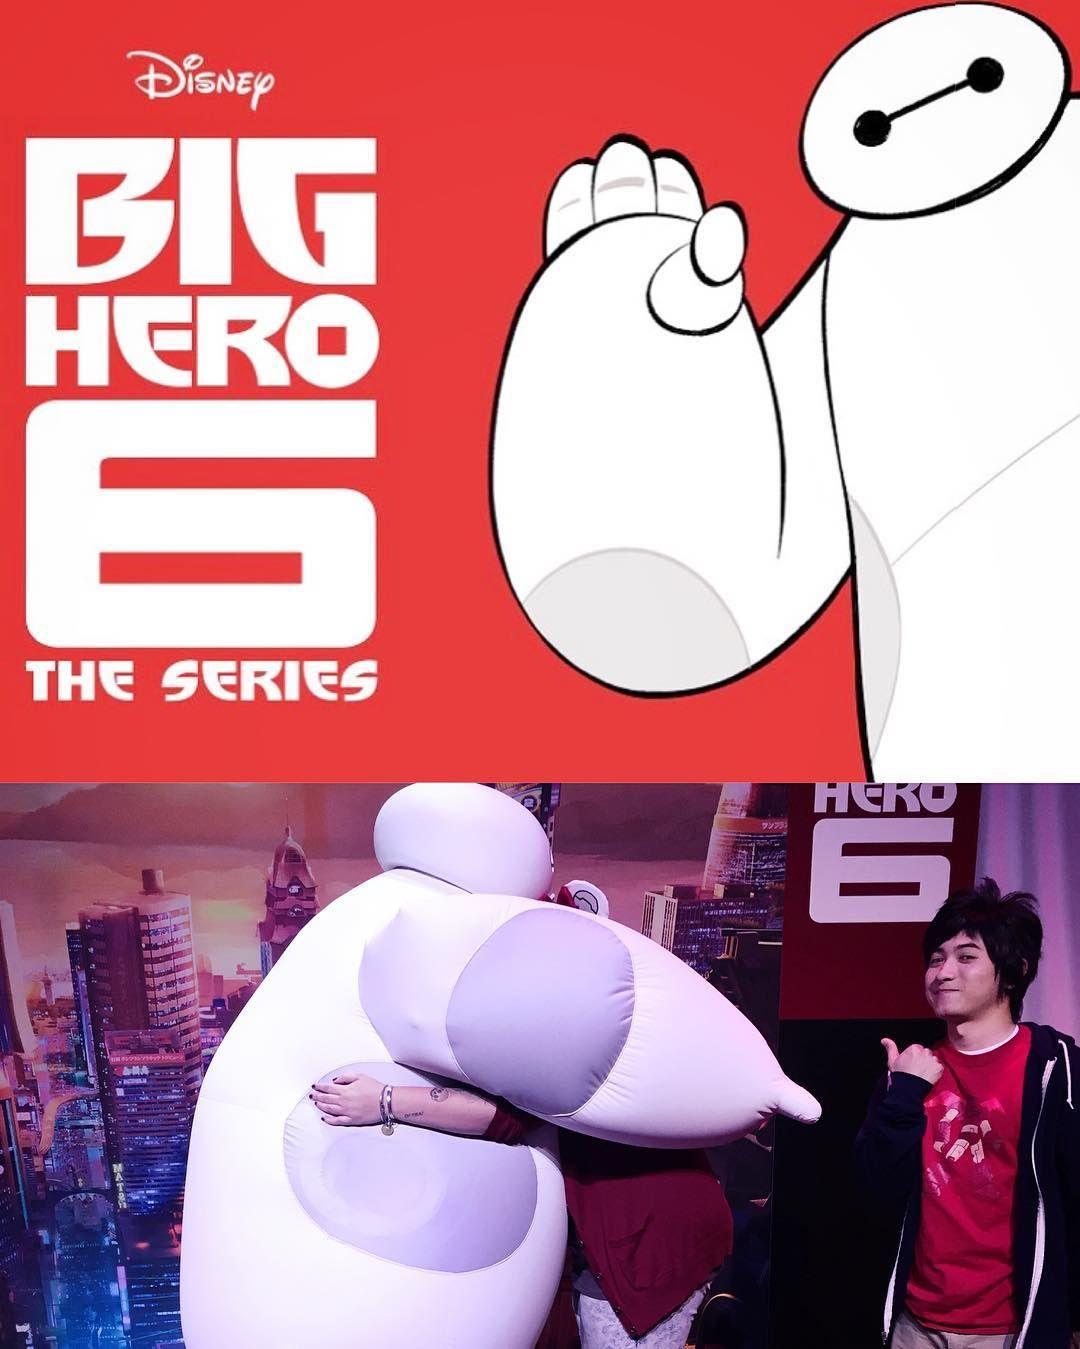 Big hugs & congrats to #Baymax #Hiro and the entire #BigHero6 gang! CANNOT wait for #BigHero6TheSeries!  #apdays #disney @disney @disneyanimation by xemilee